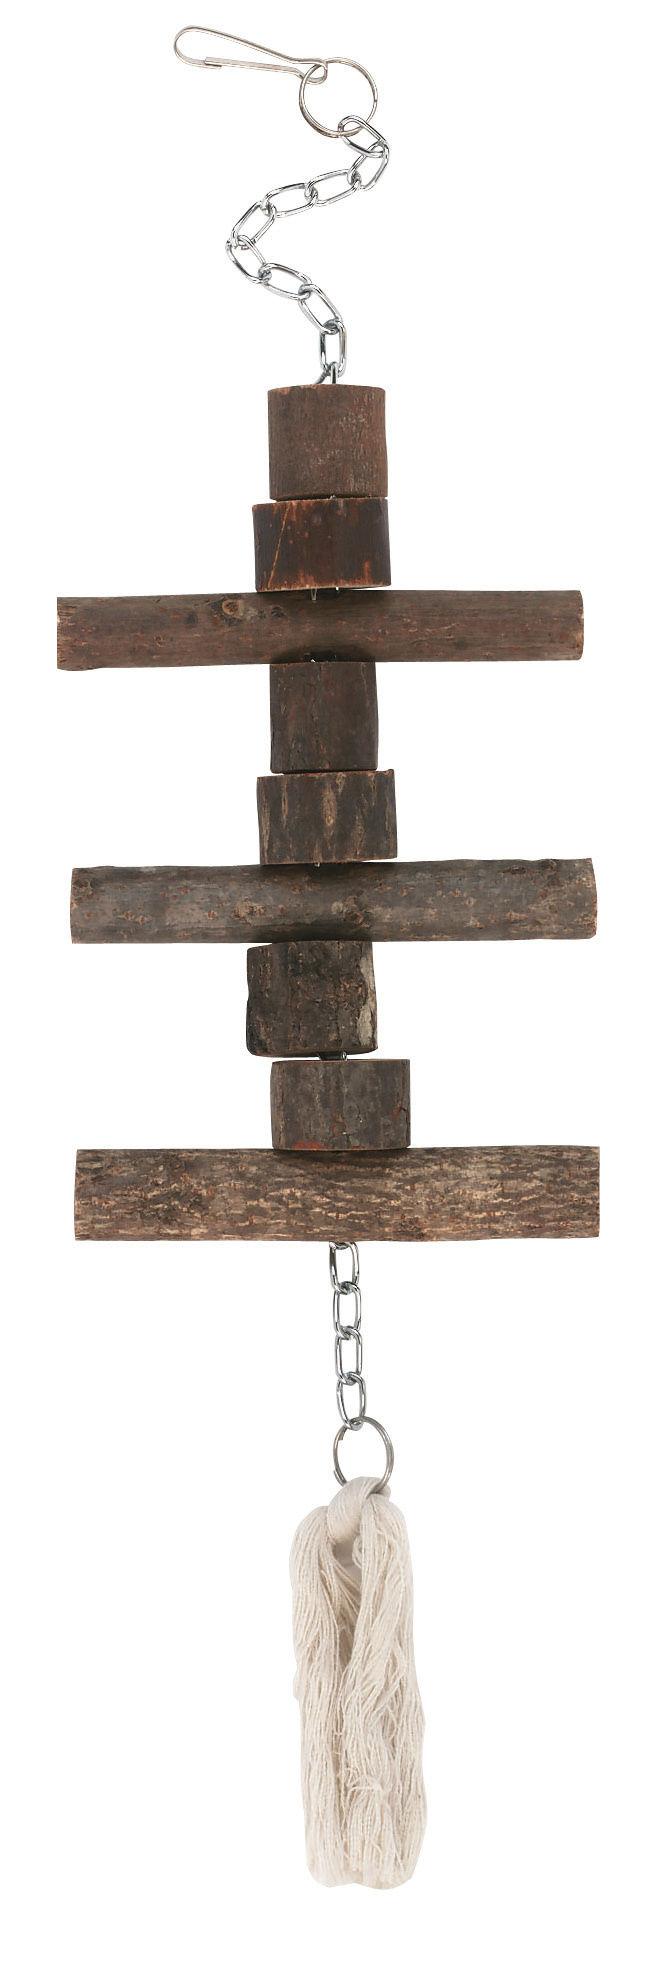 Papageienspielzeug, Naturholz, 40 cm